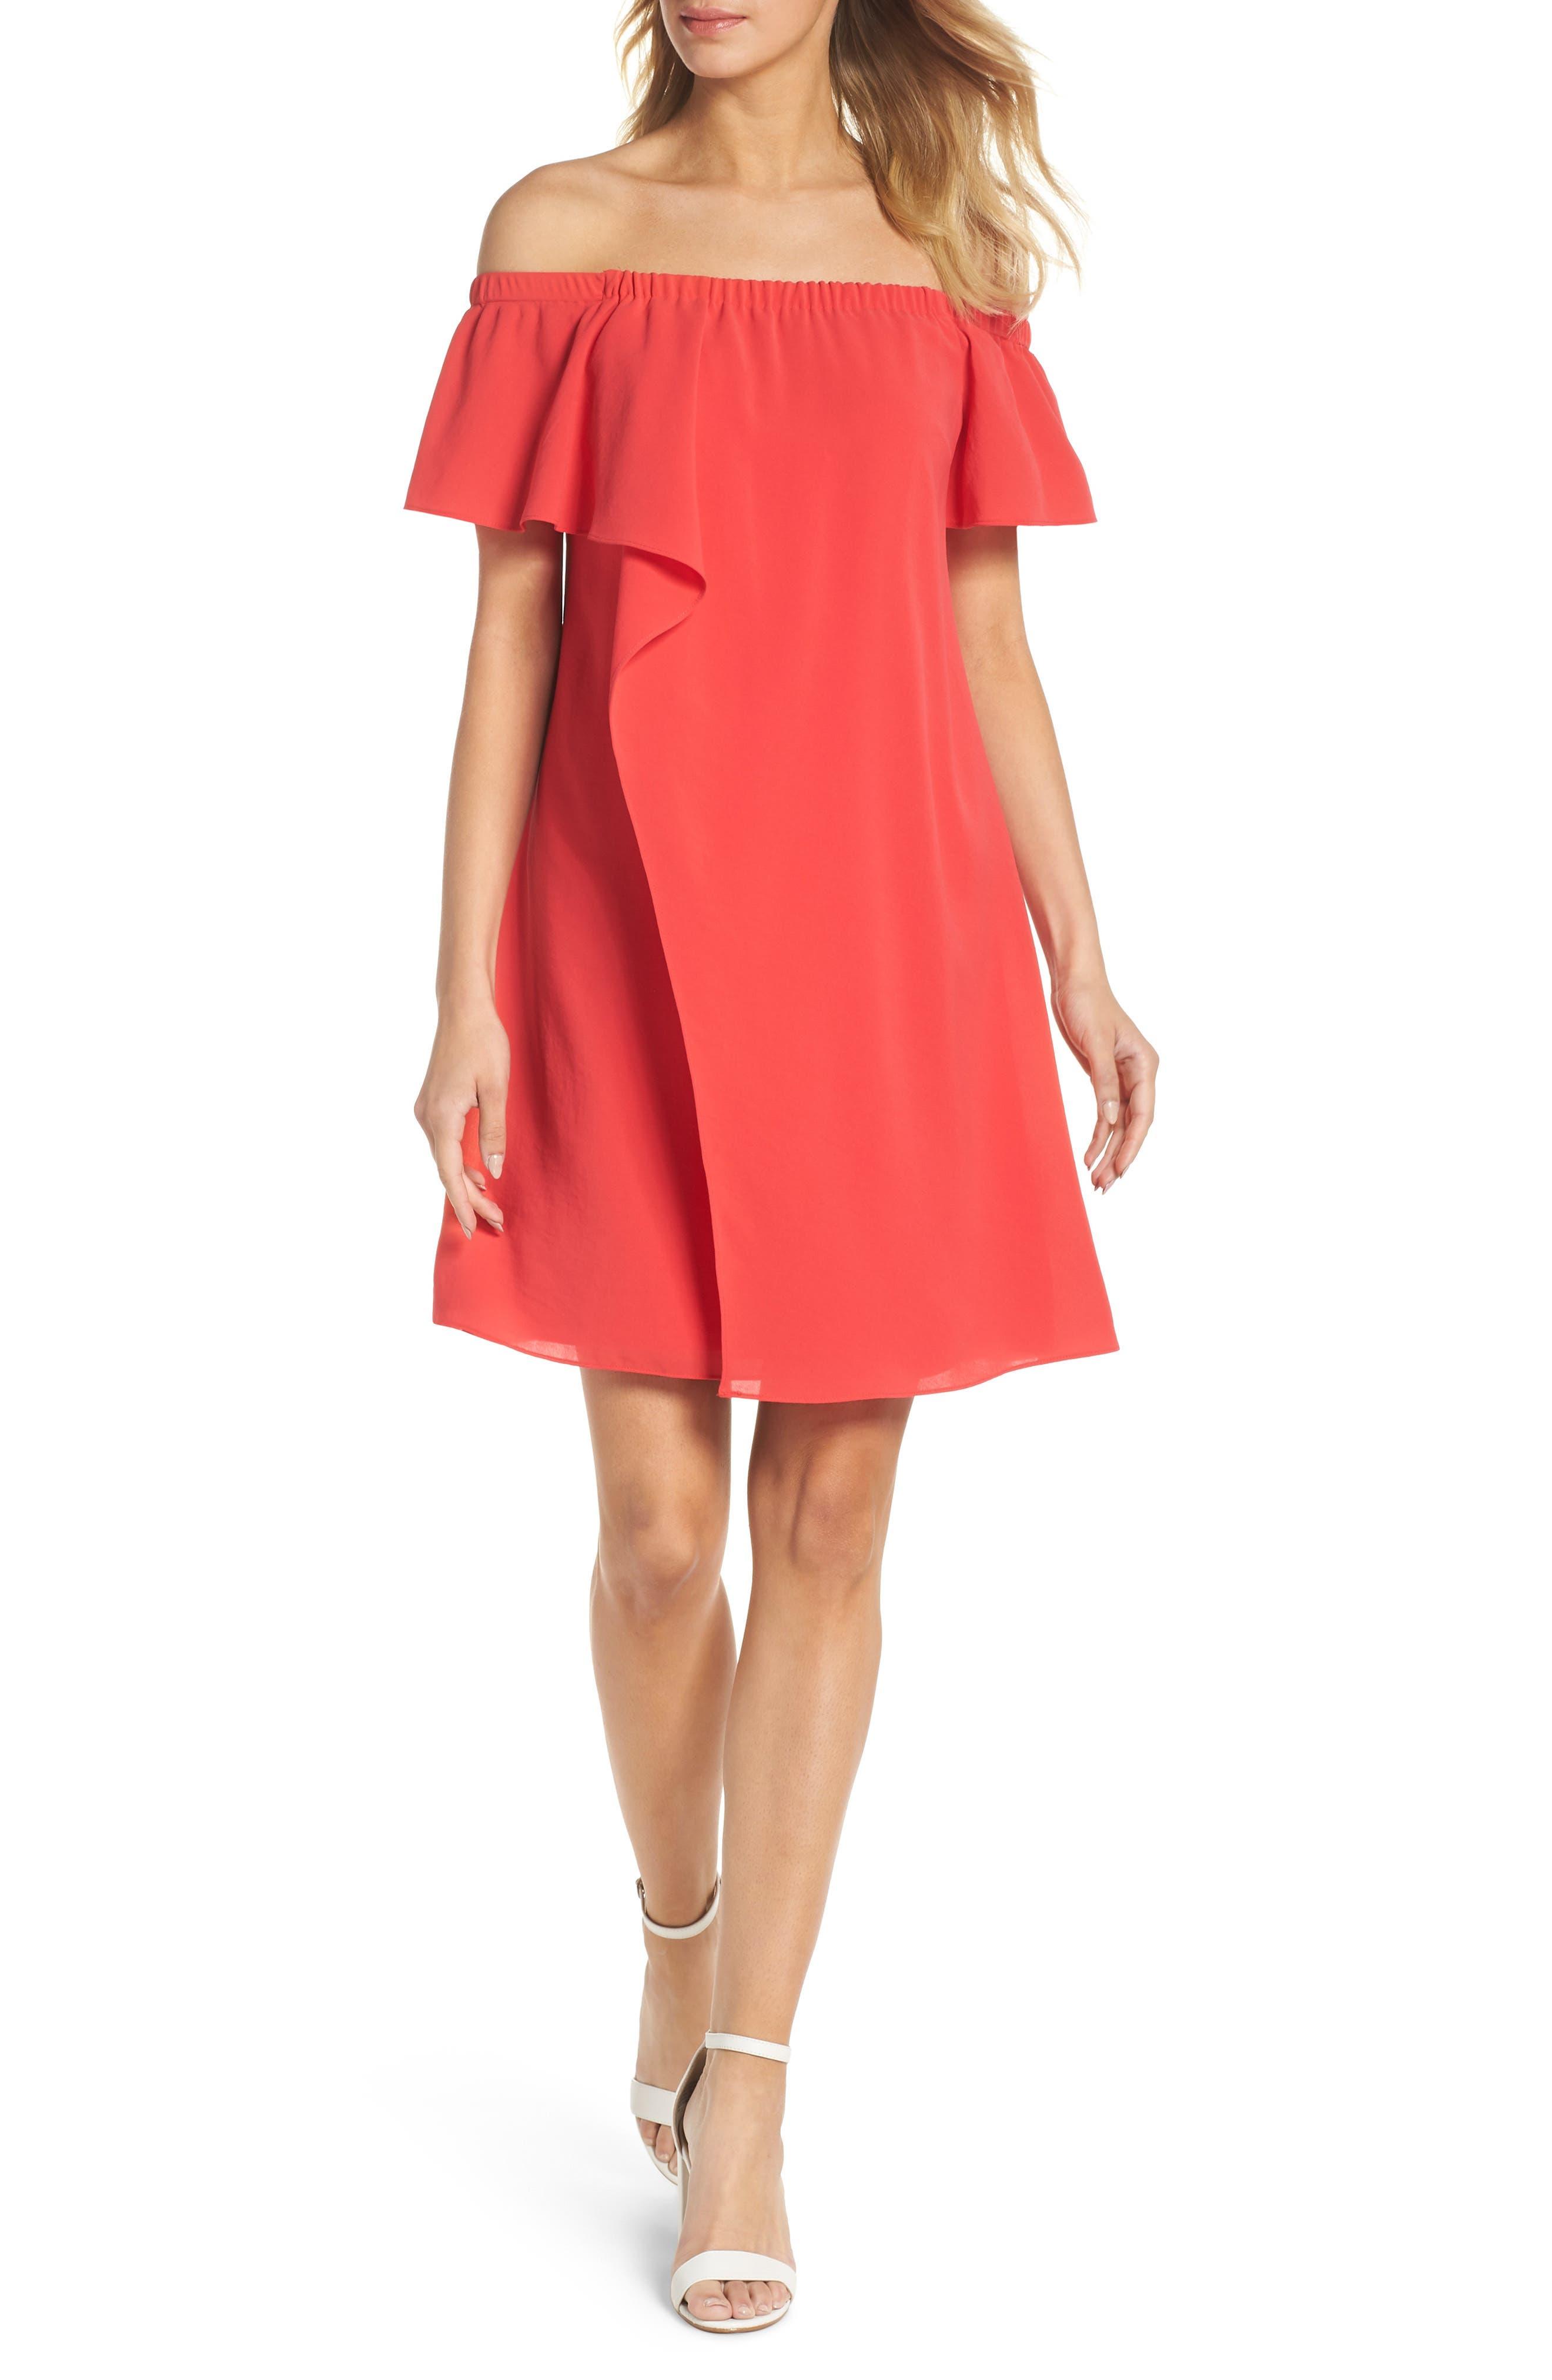 Off the Shoulder Crepe Dress,                             Main thumbnail 1, color,                             625